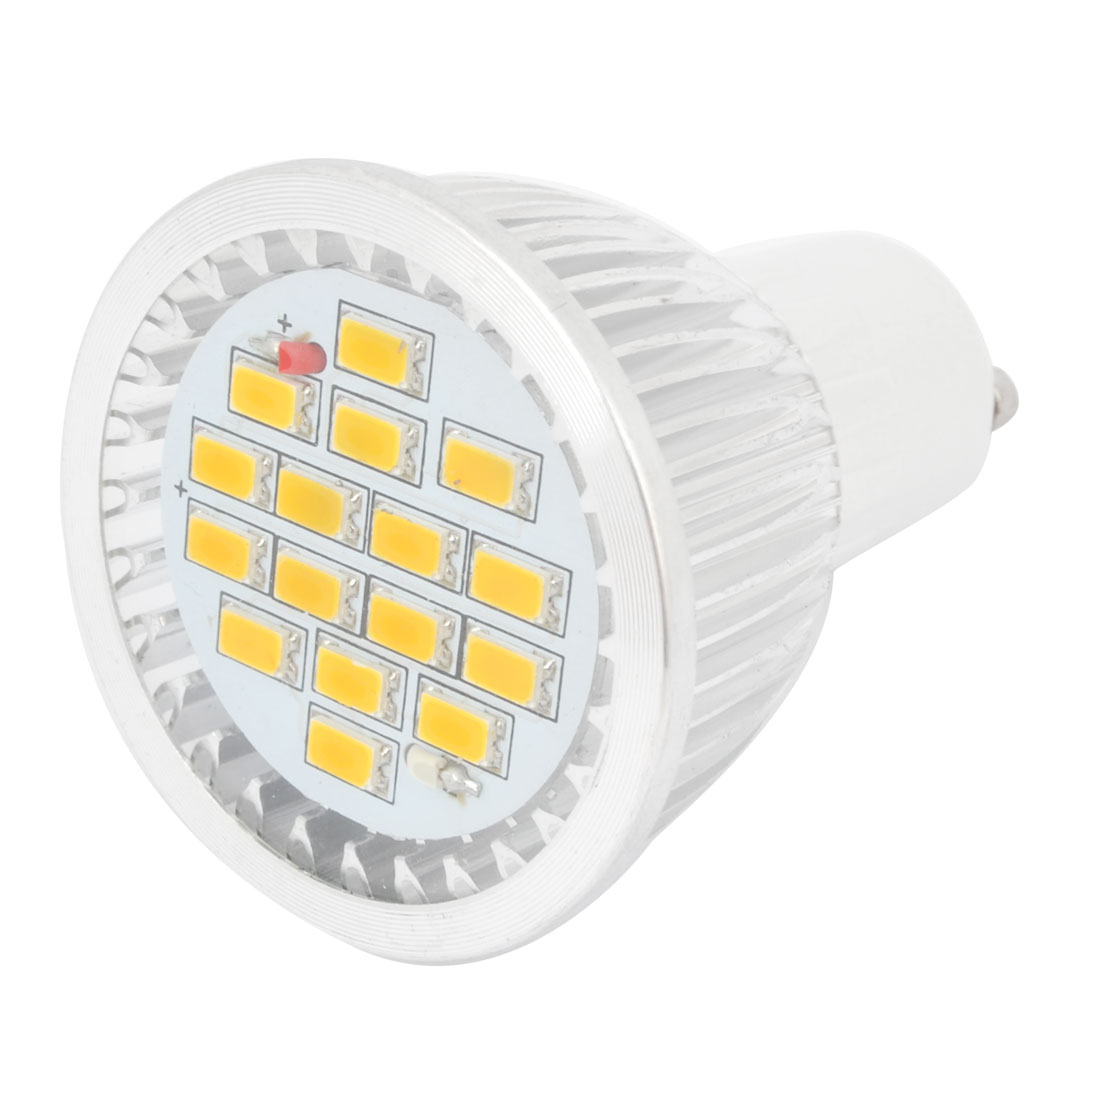 AC 220V GU10 Base 16 3528 SMD 3W Warm White LED Down Light Spotlight Bulb